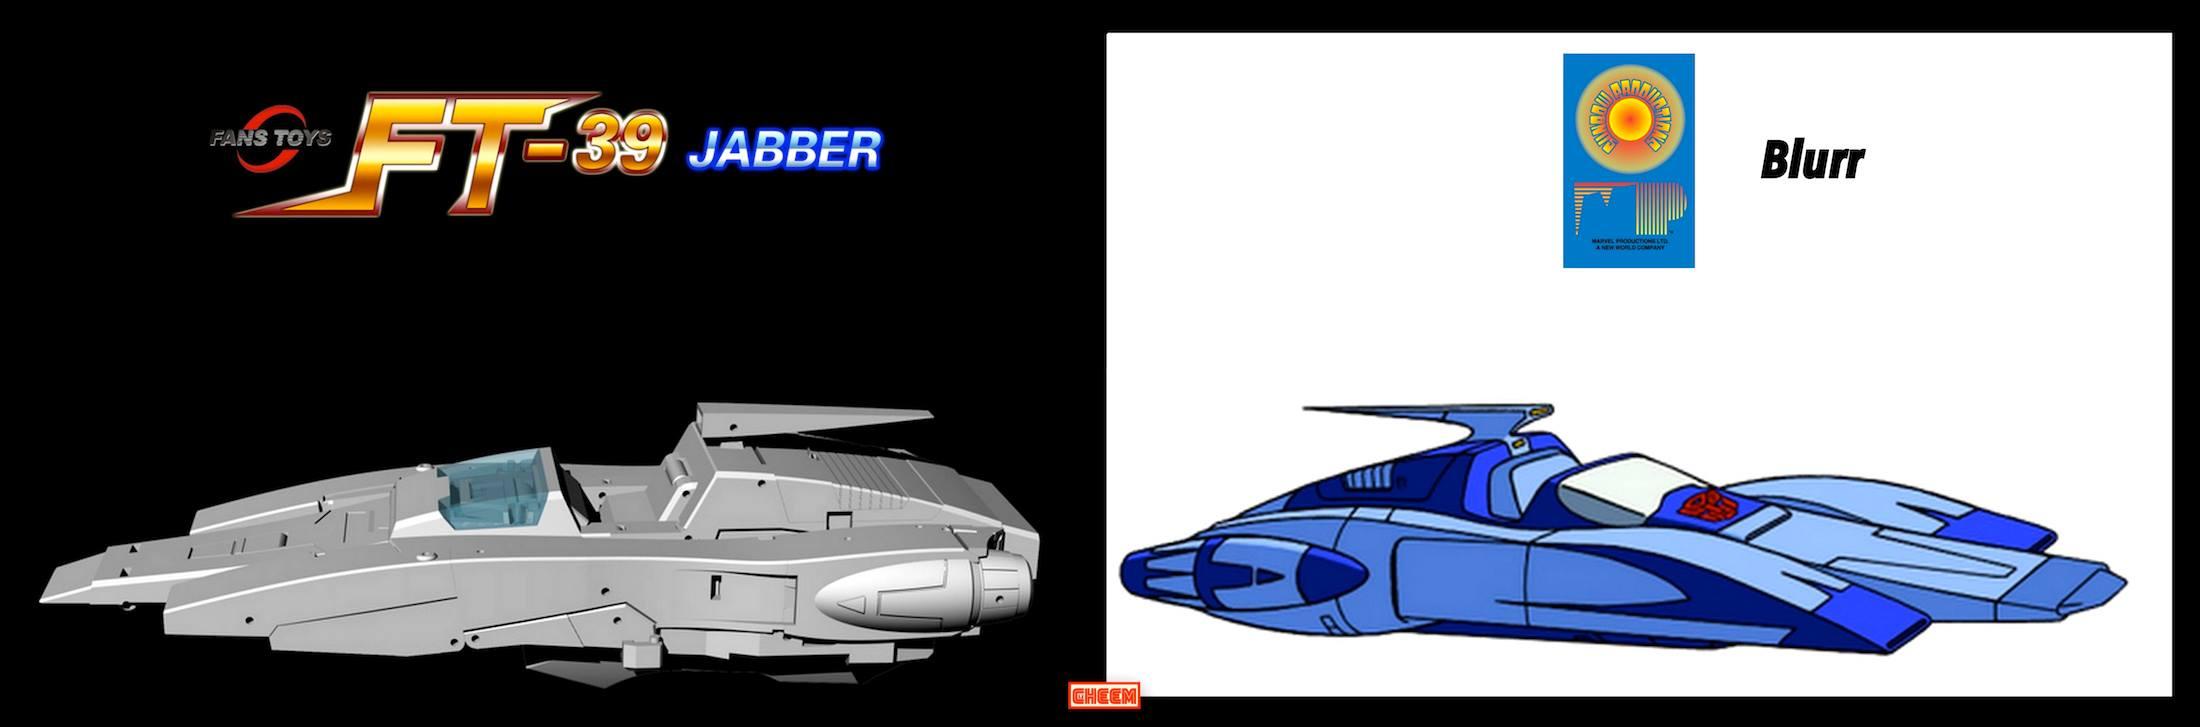 [Fanstoys] Produit Tiers - Jouet FT-39 Jabber - aka Blurr/Brouillo BHq7iKeX_o